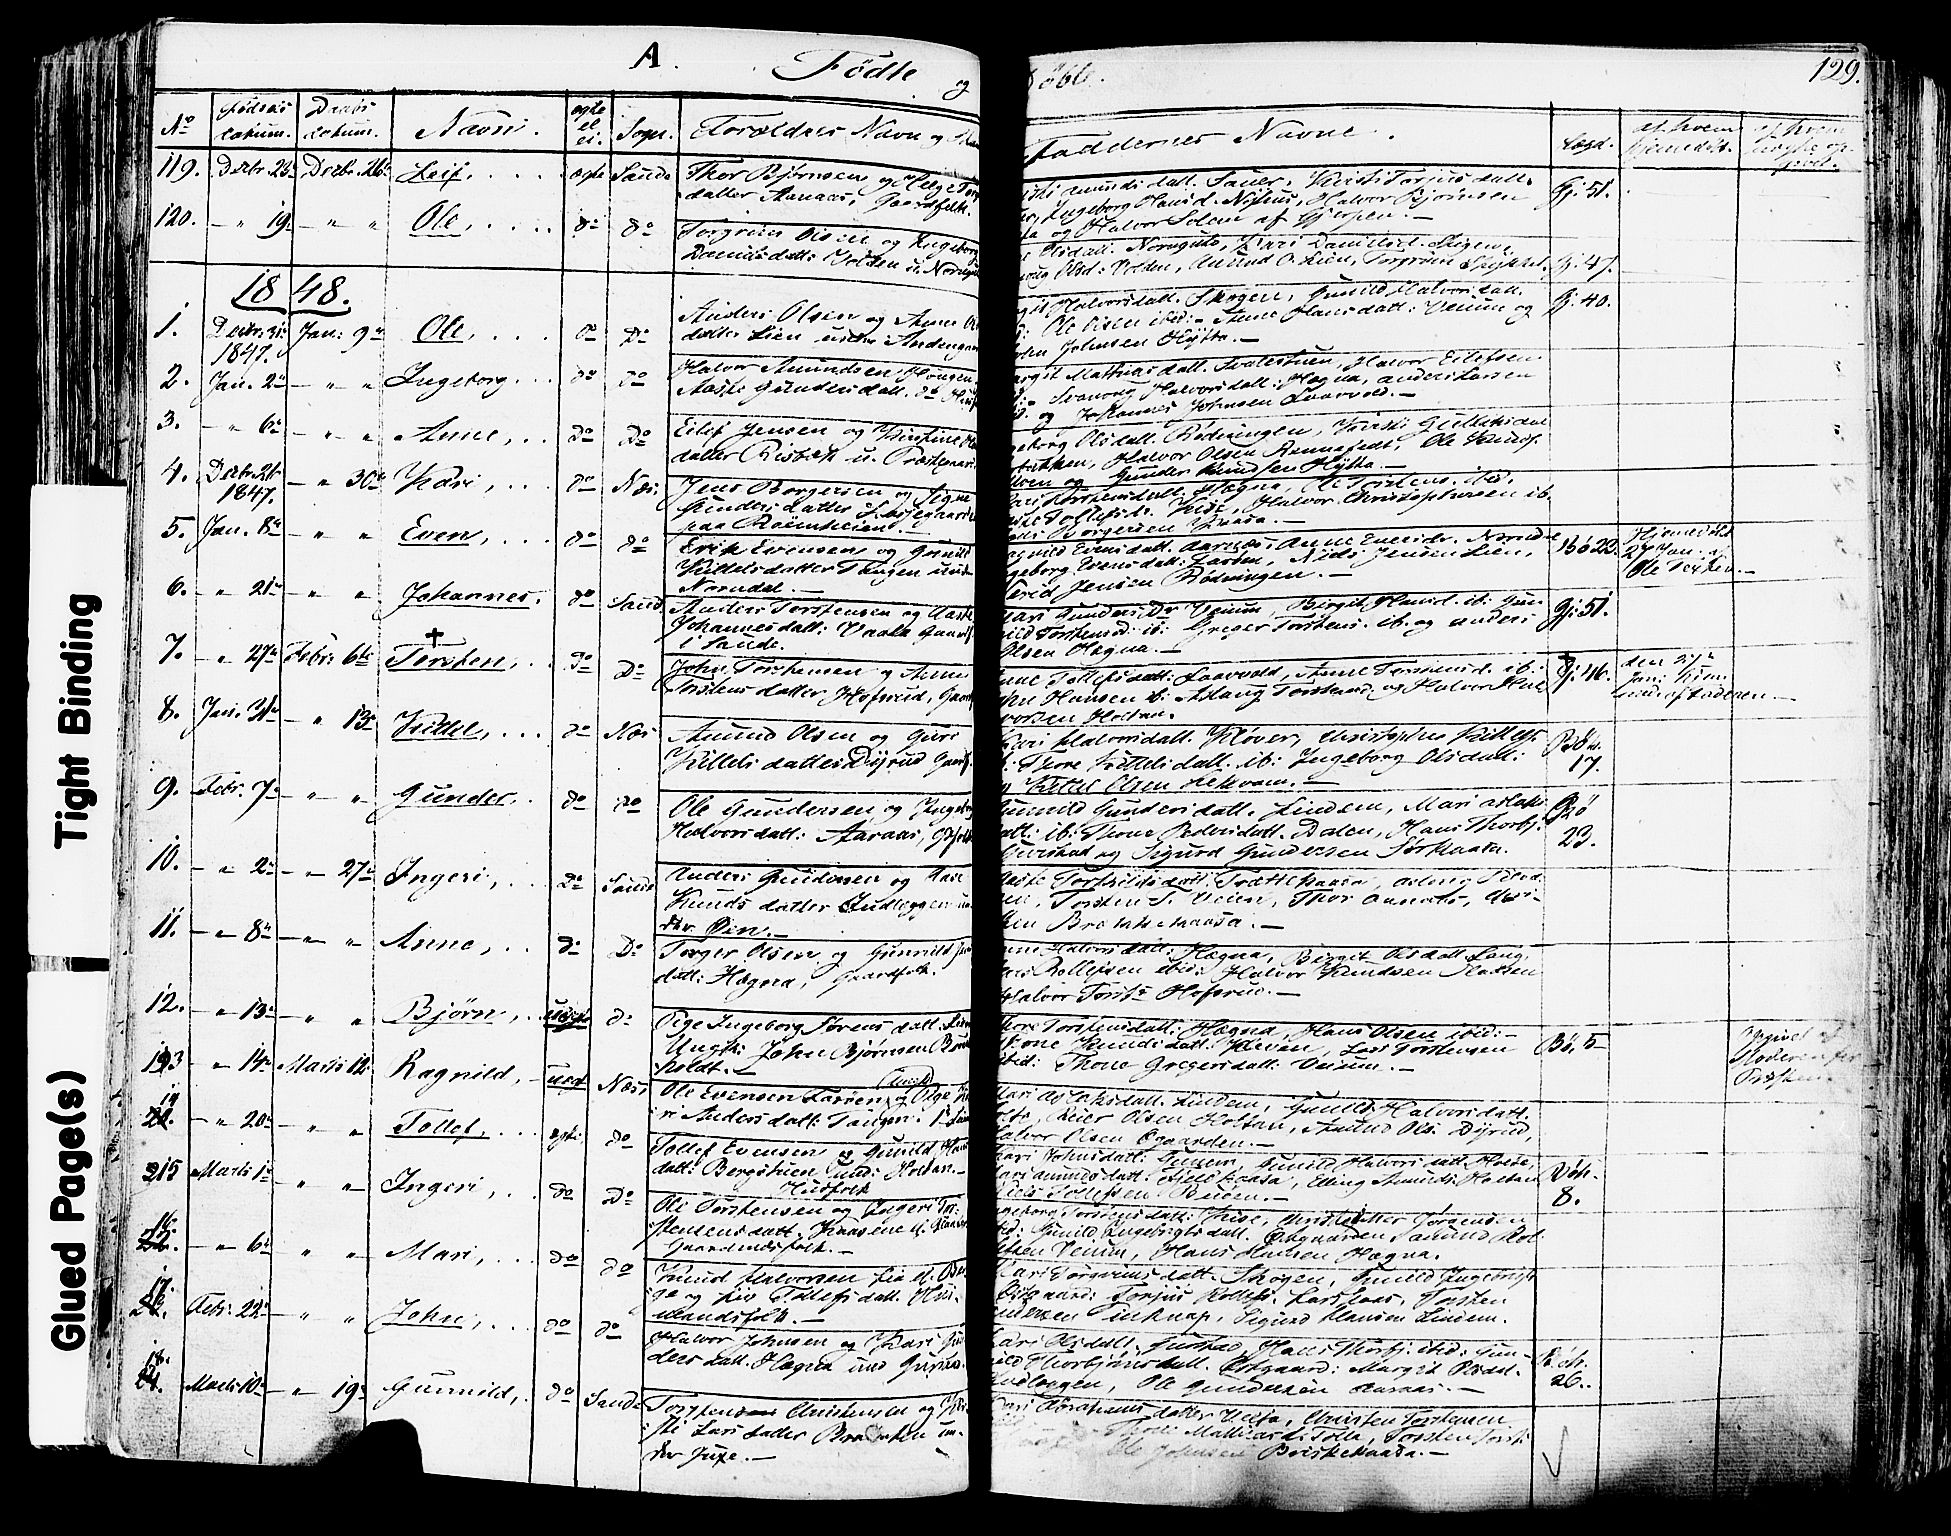 SAKO, Sauherad kirkebøker, F/Fa/L0006: Ministerialbok nr. I 6, 1827-1850, s. 129